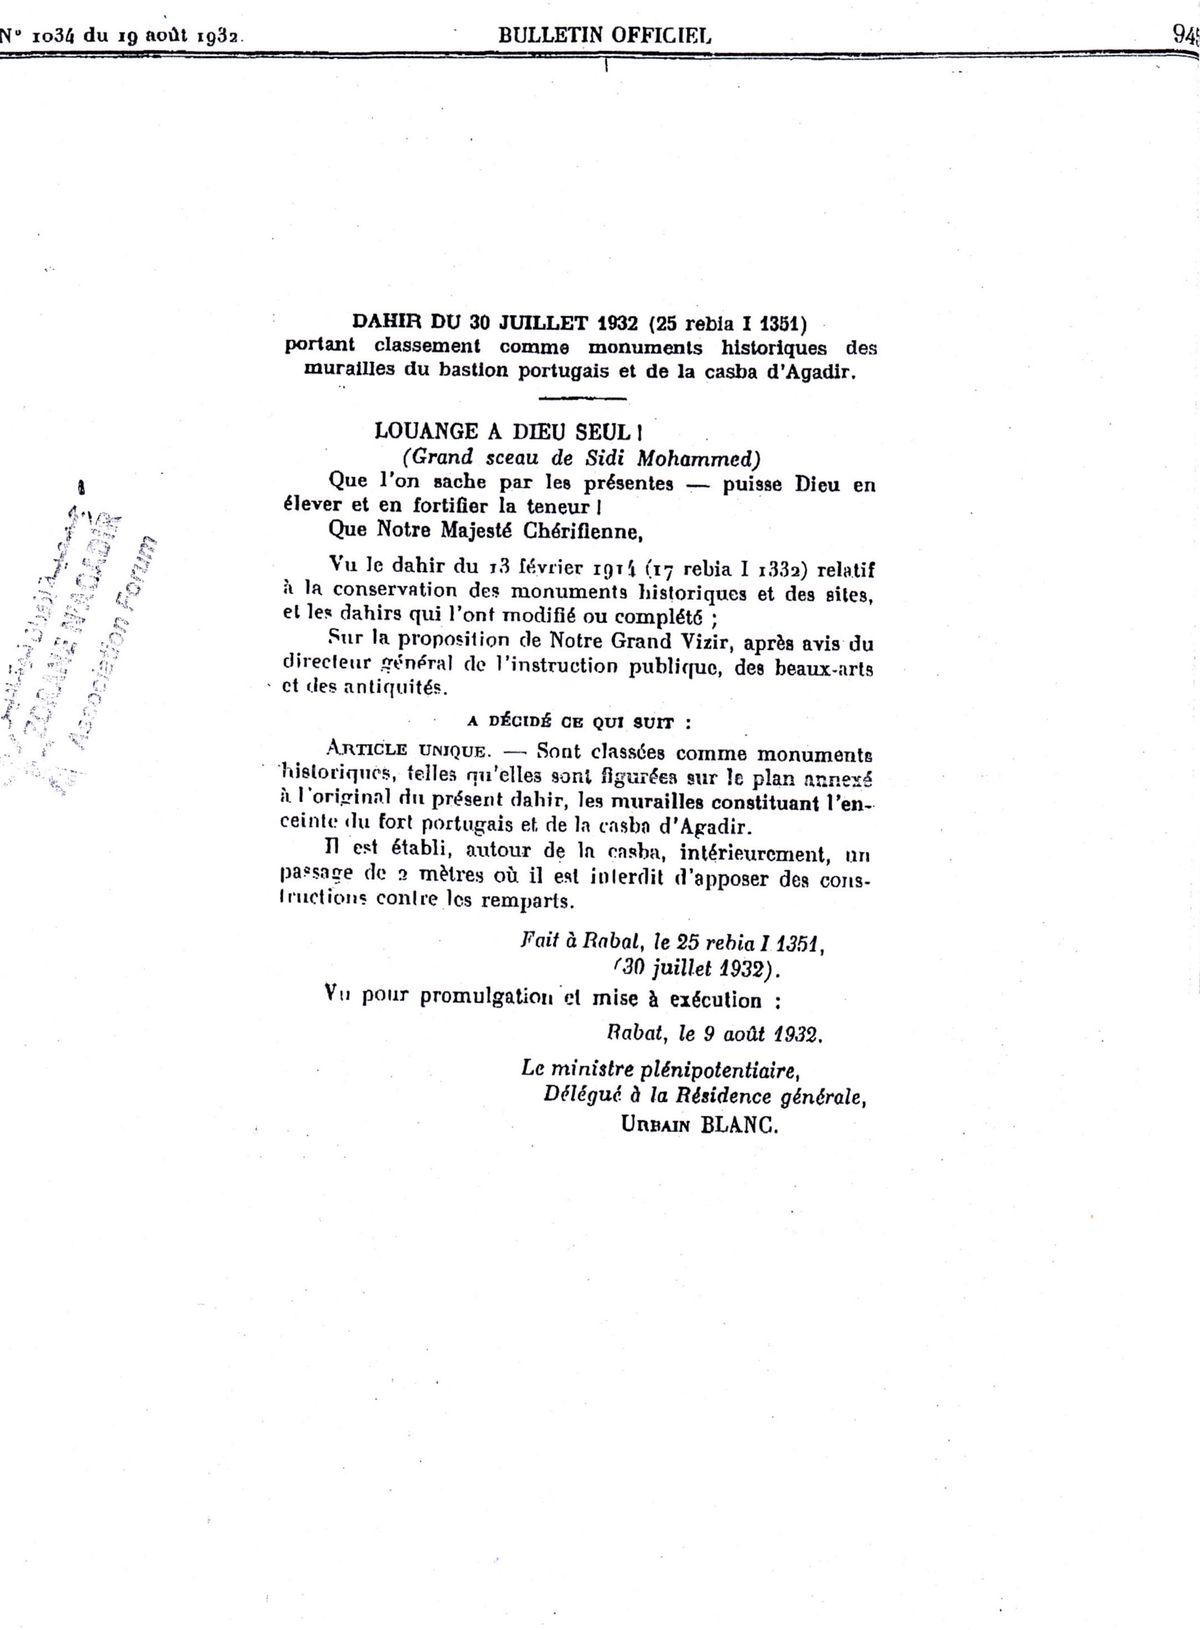 Dahir du 20 juillet 1932